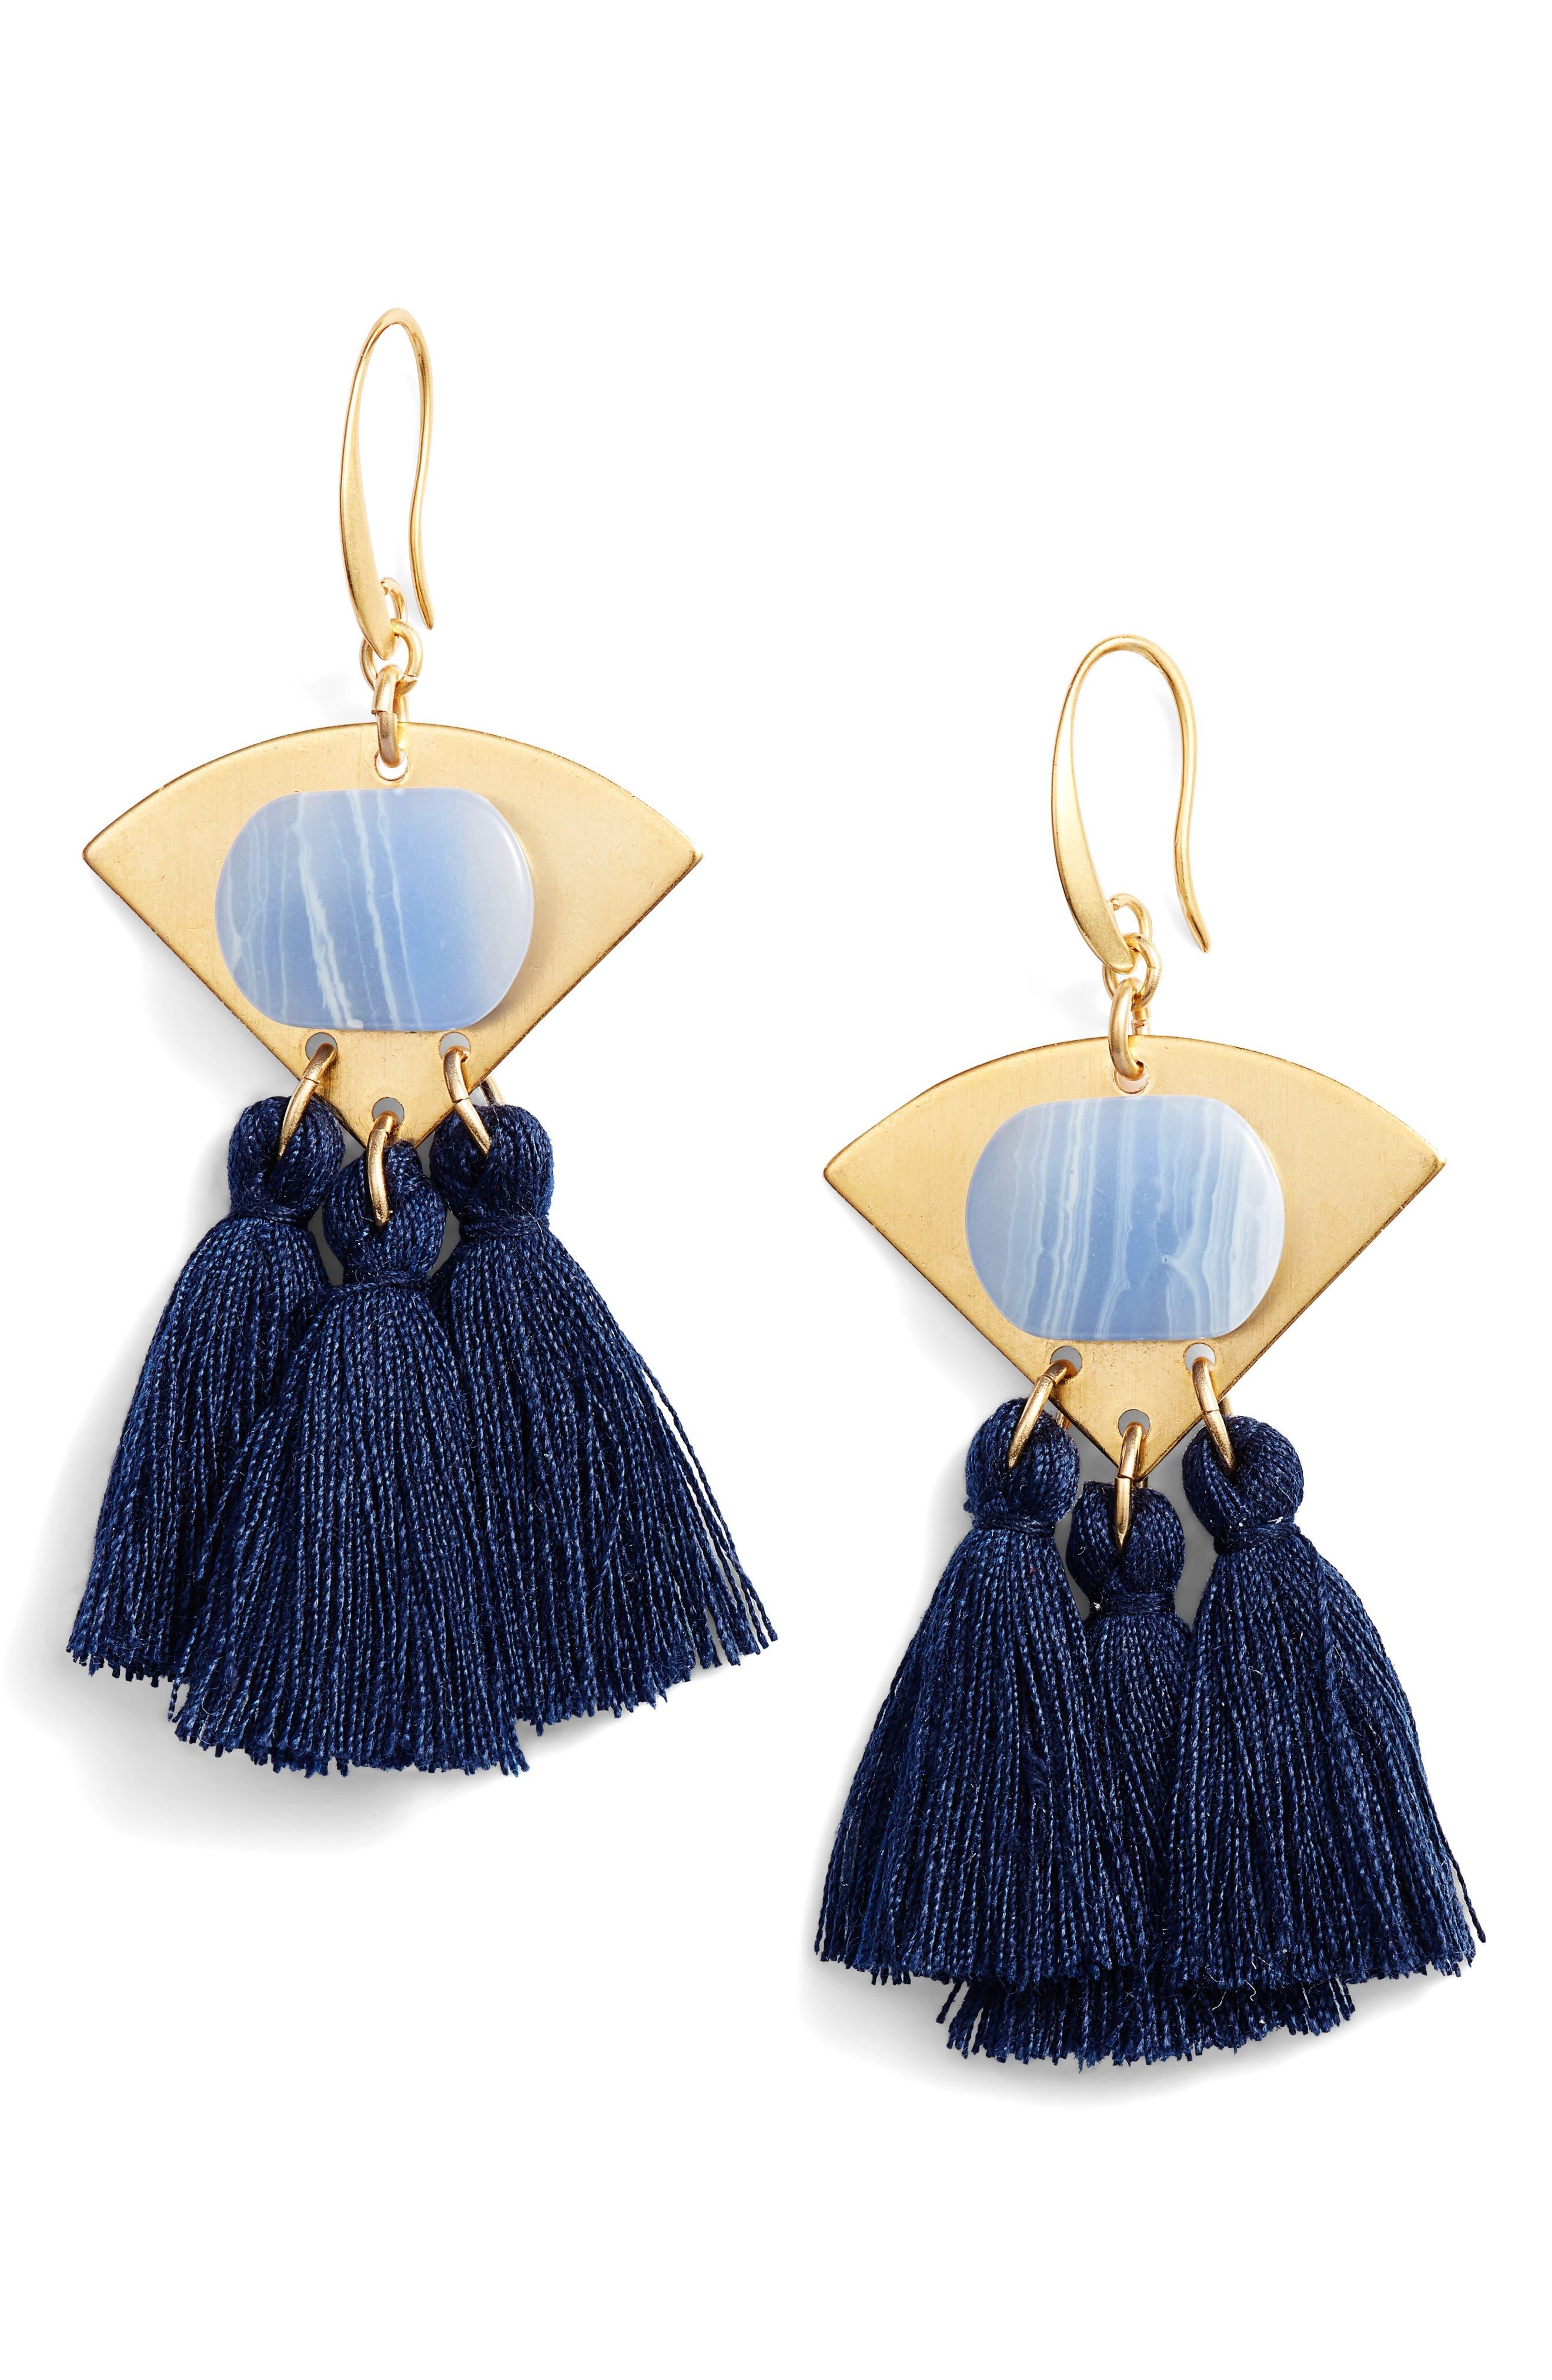 3-Tassel Earrings,                             Main thumbnail 1, color,